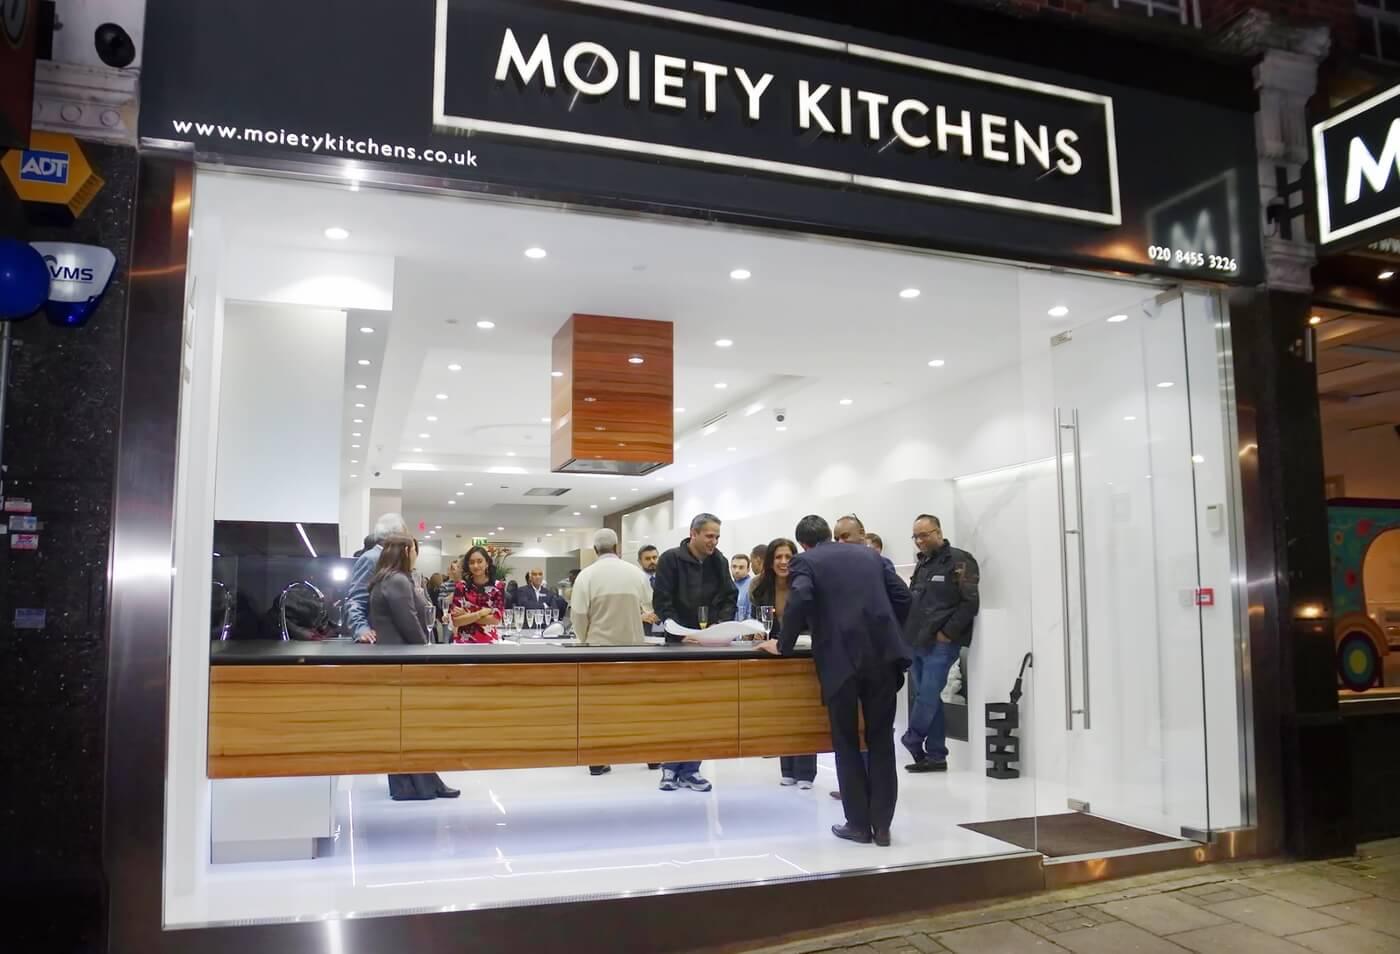 Moiety-kitchen-Showroom-front-sm.jpg